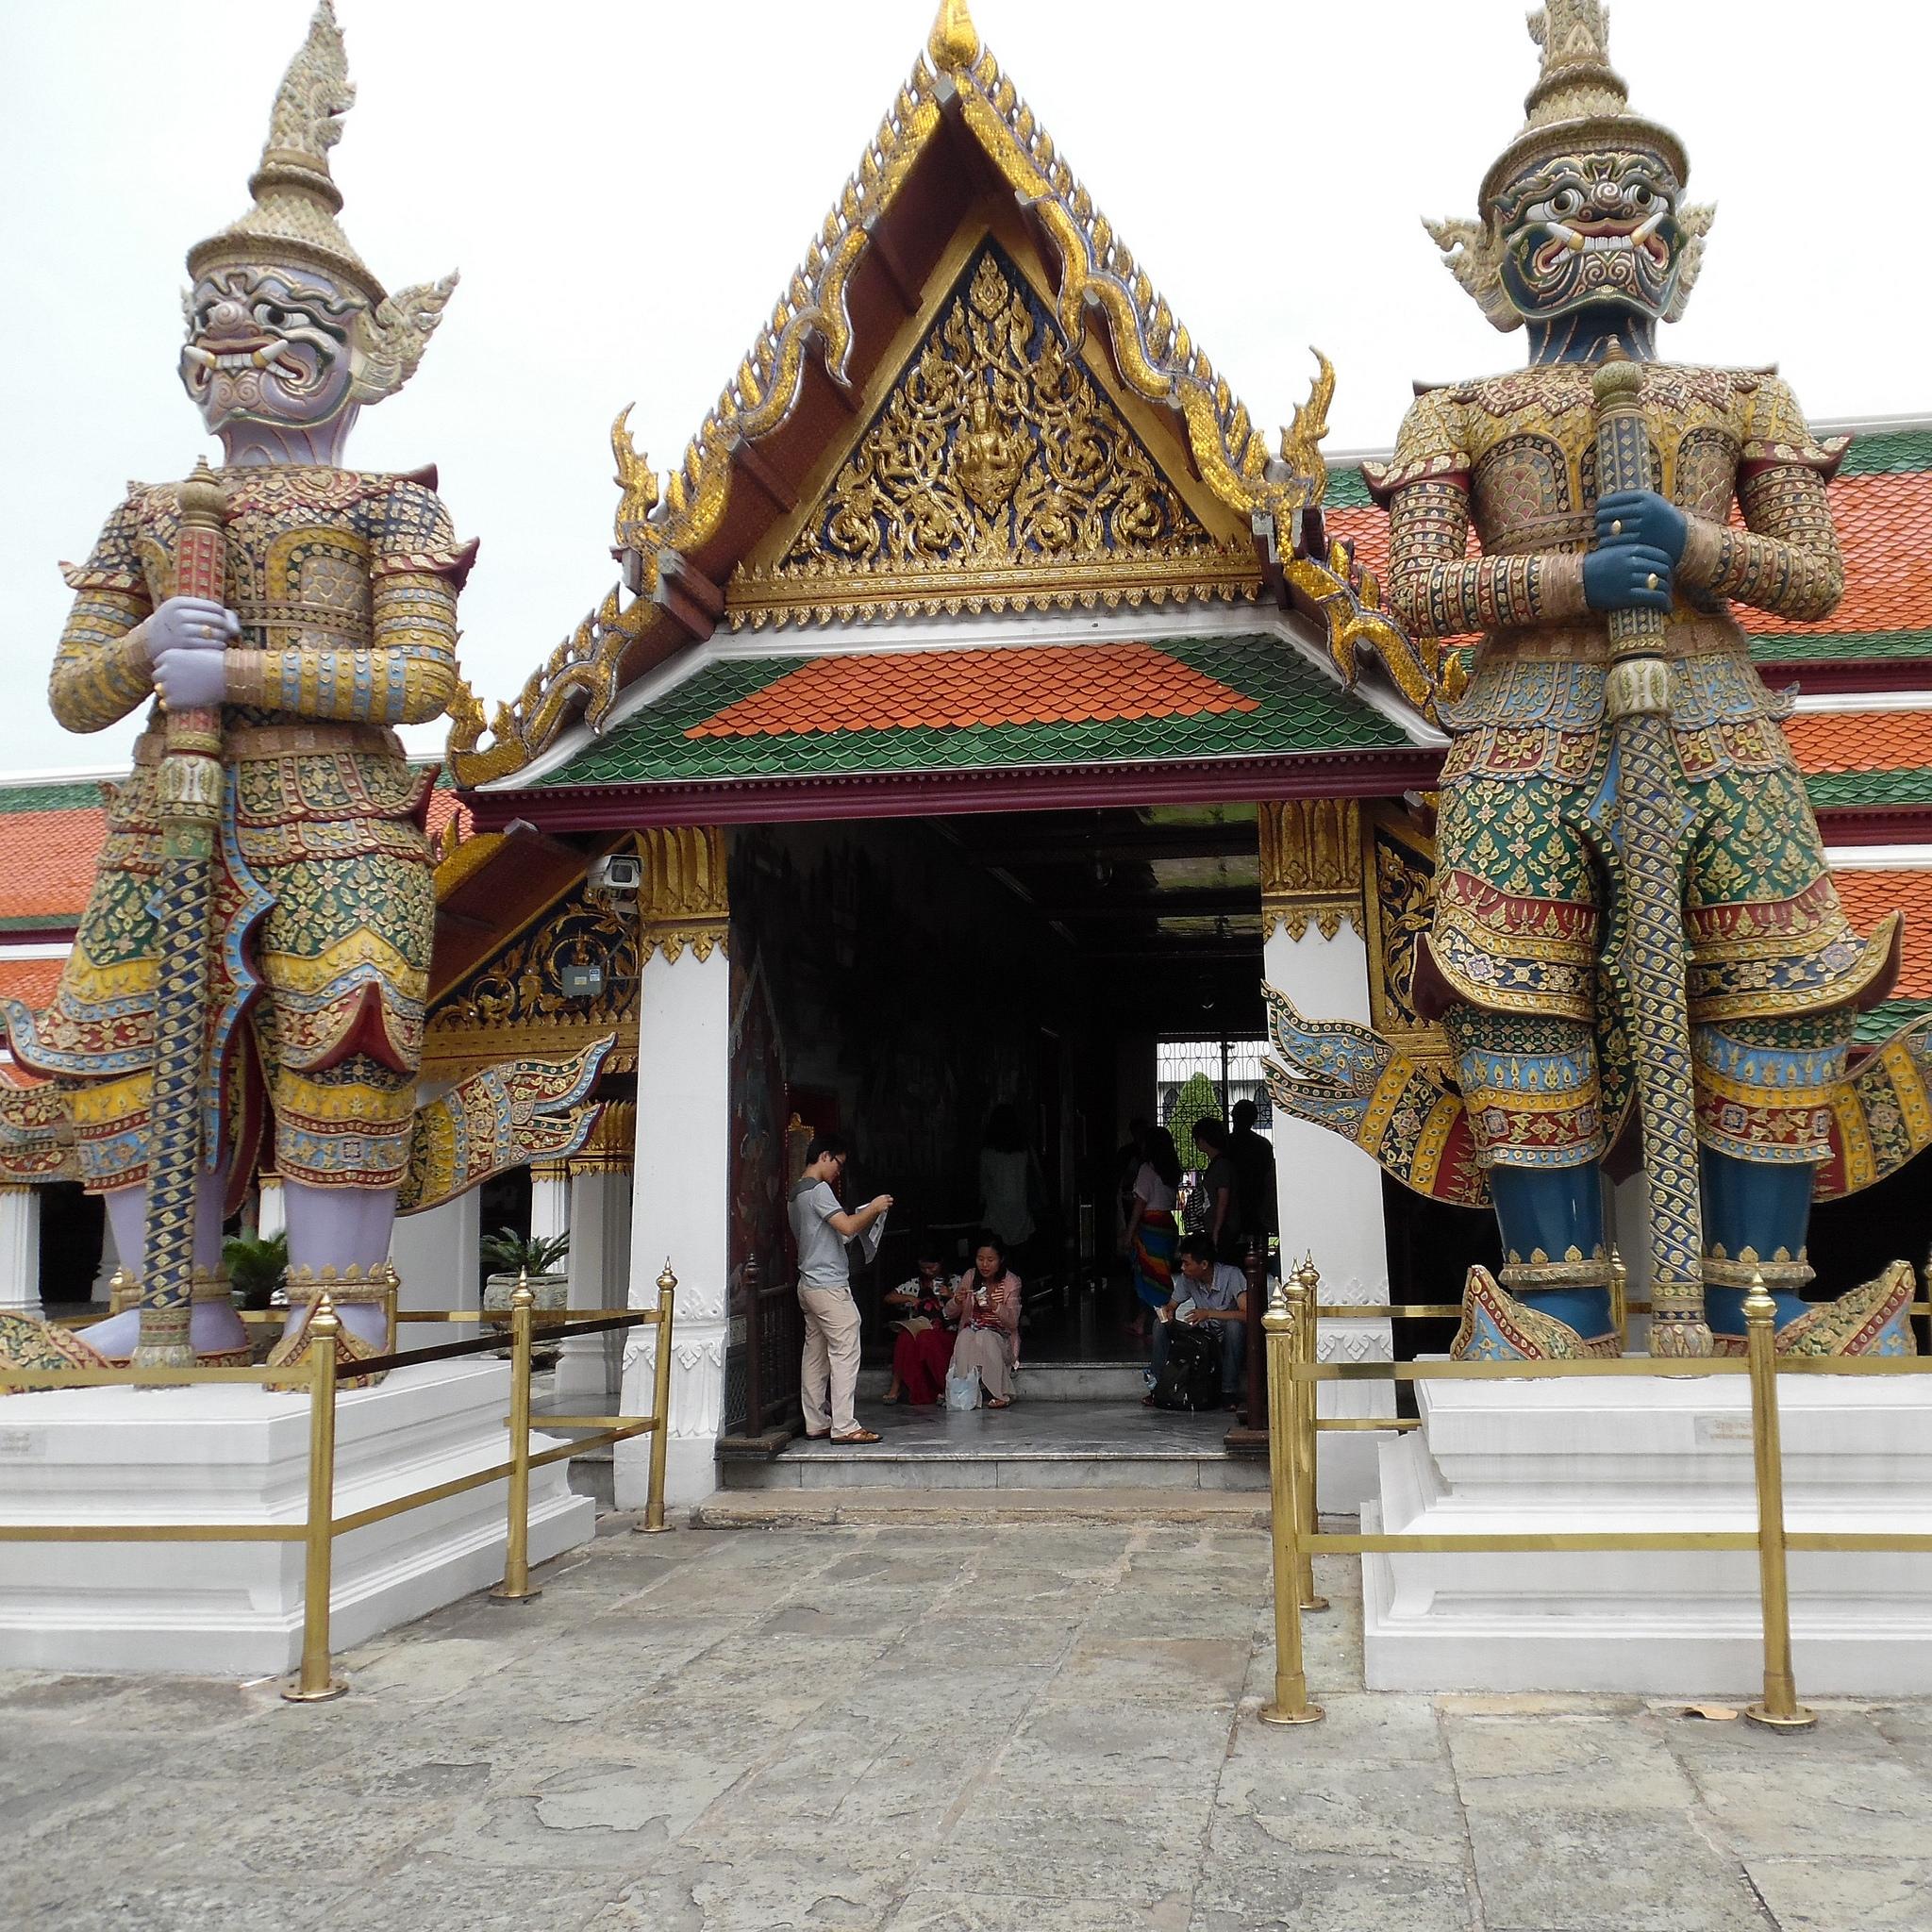 CISabroad Study abroad semester program Thailand bangkok city tour